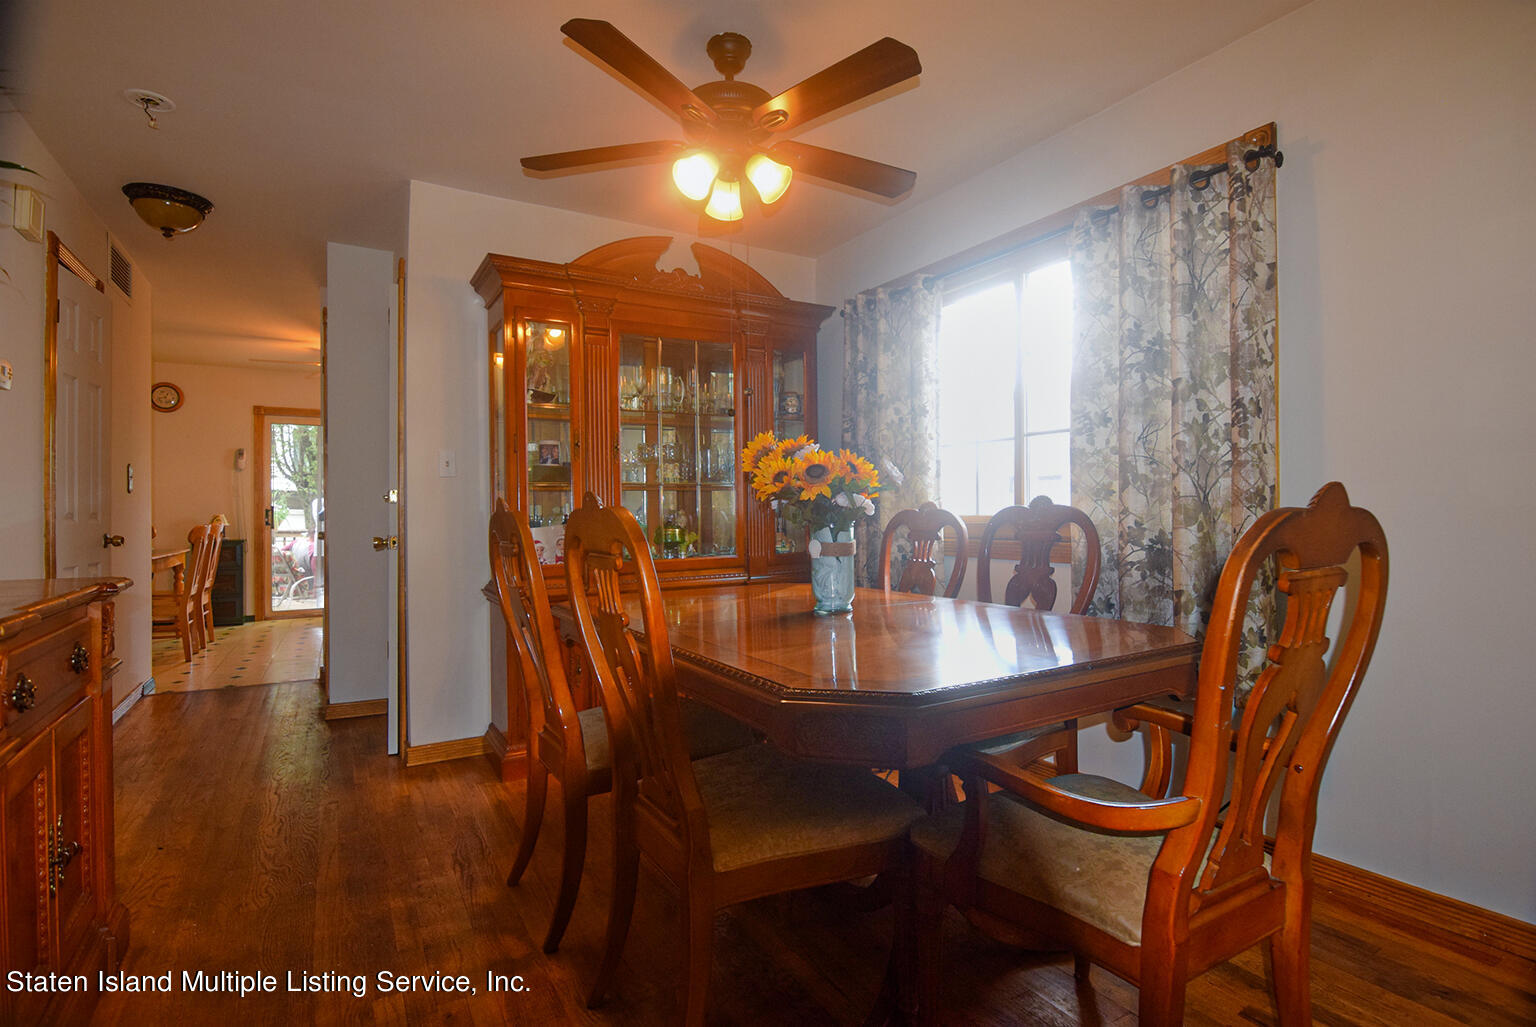 Single Family - Semi-Attached 524 Tennyson Drive  Staten Island, NY 10312, MLS-1149452-5